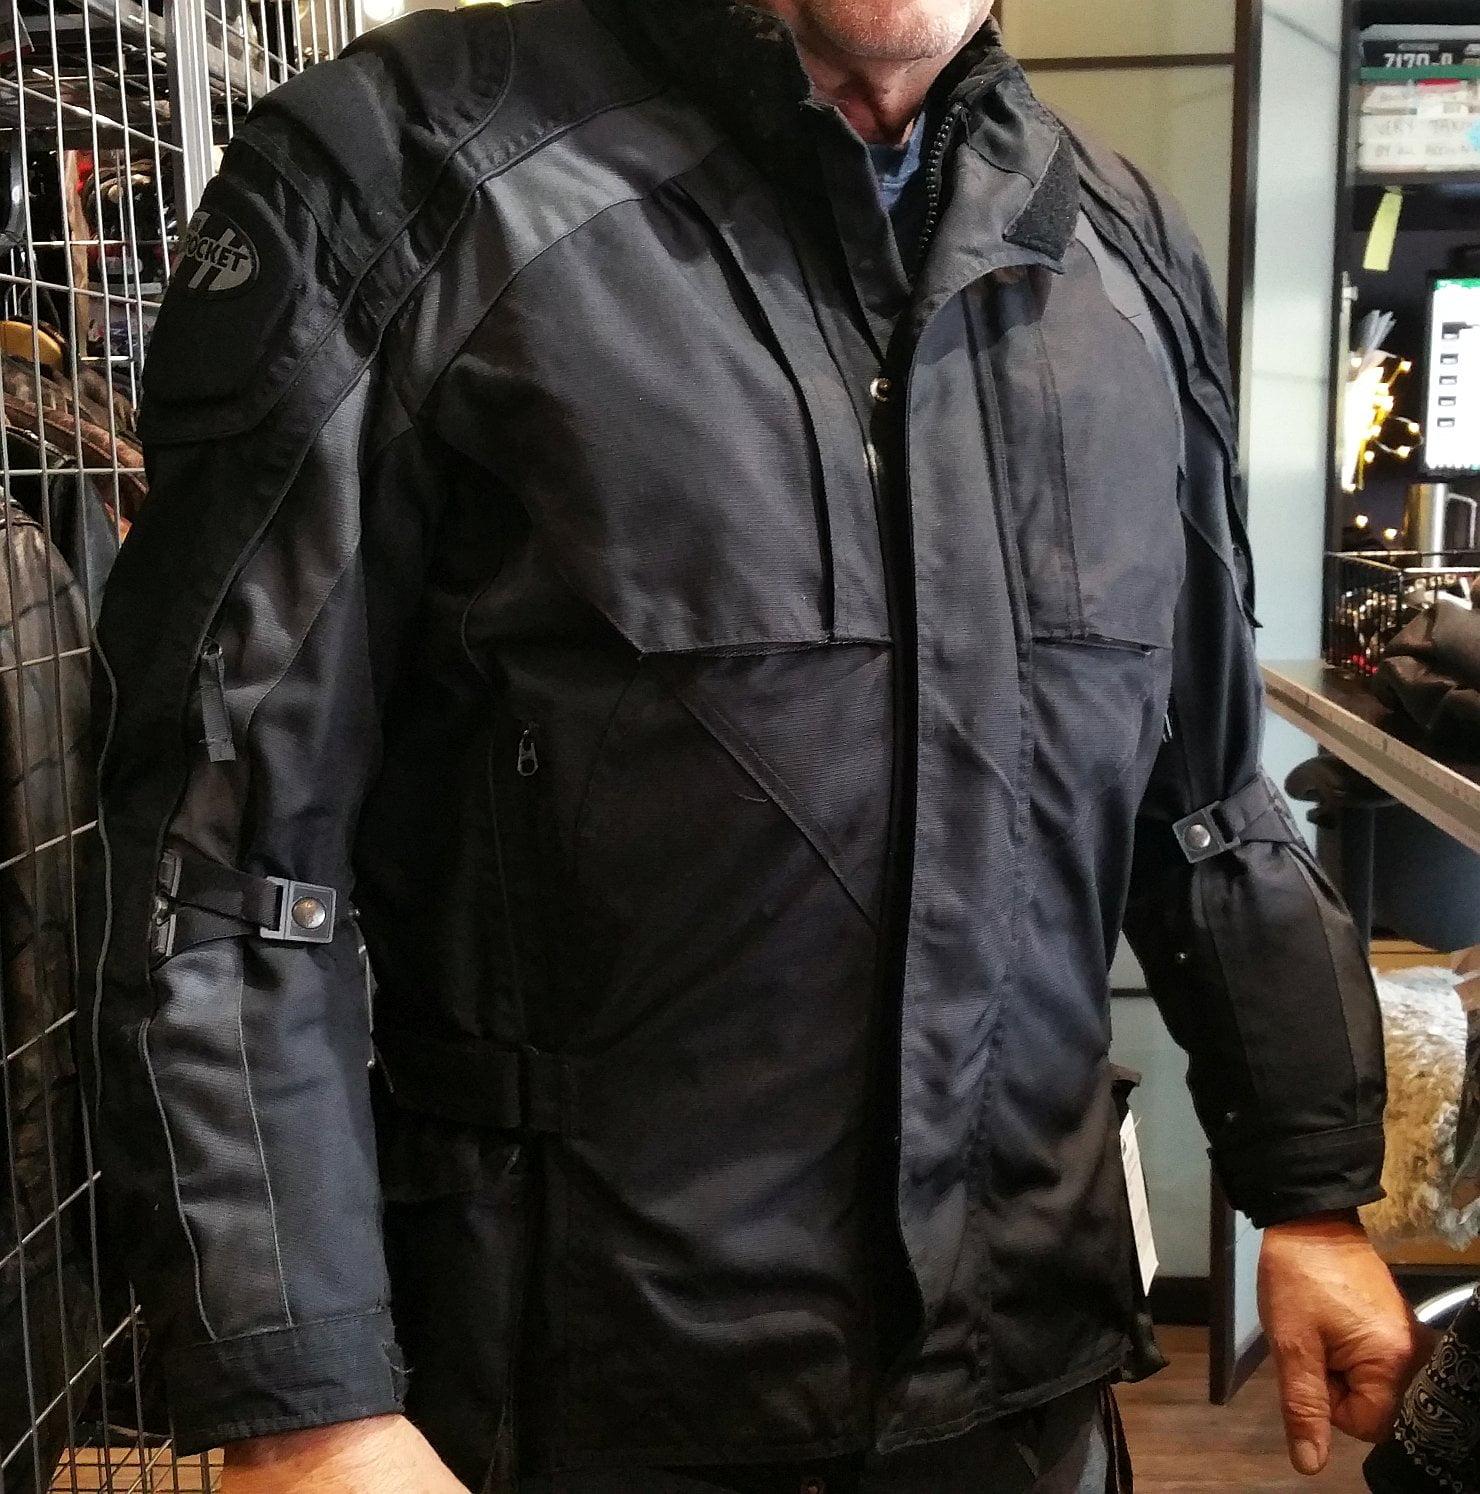 Fight winter butt-chill in this Joe Rocket jacket